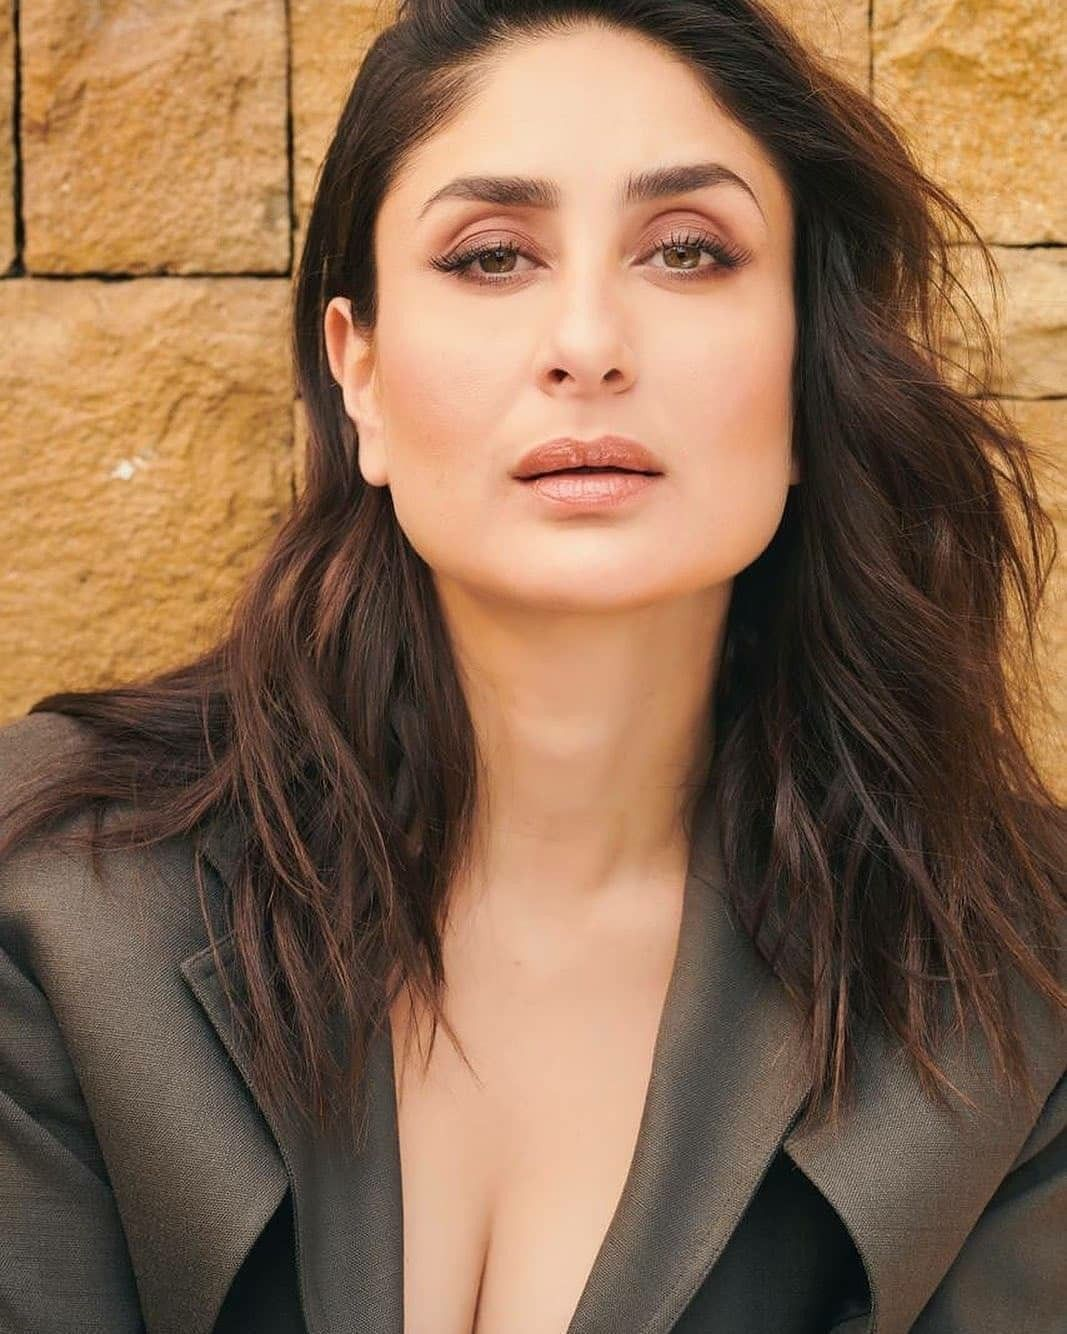 Kareena Kapoor Khan Kareena Kapoor Kareena Kapoor Khan Bollywood Celebrities